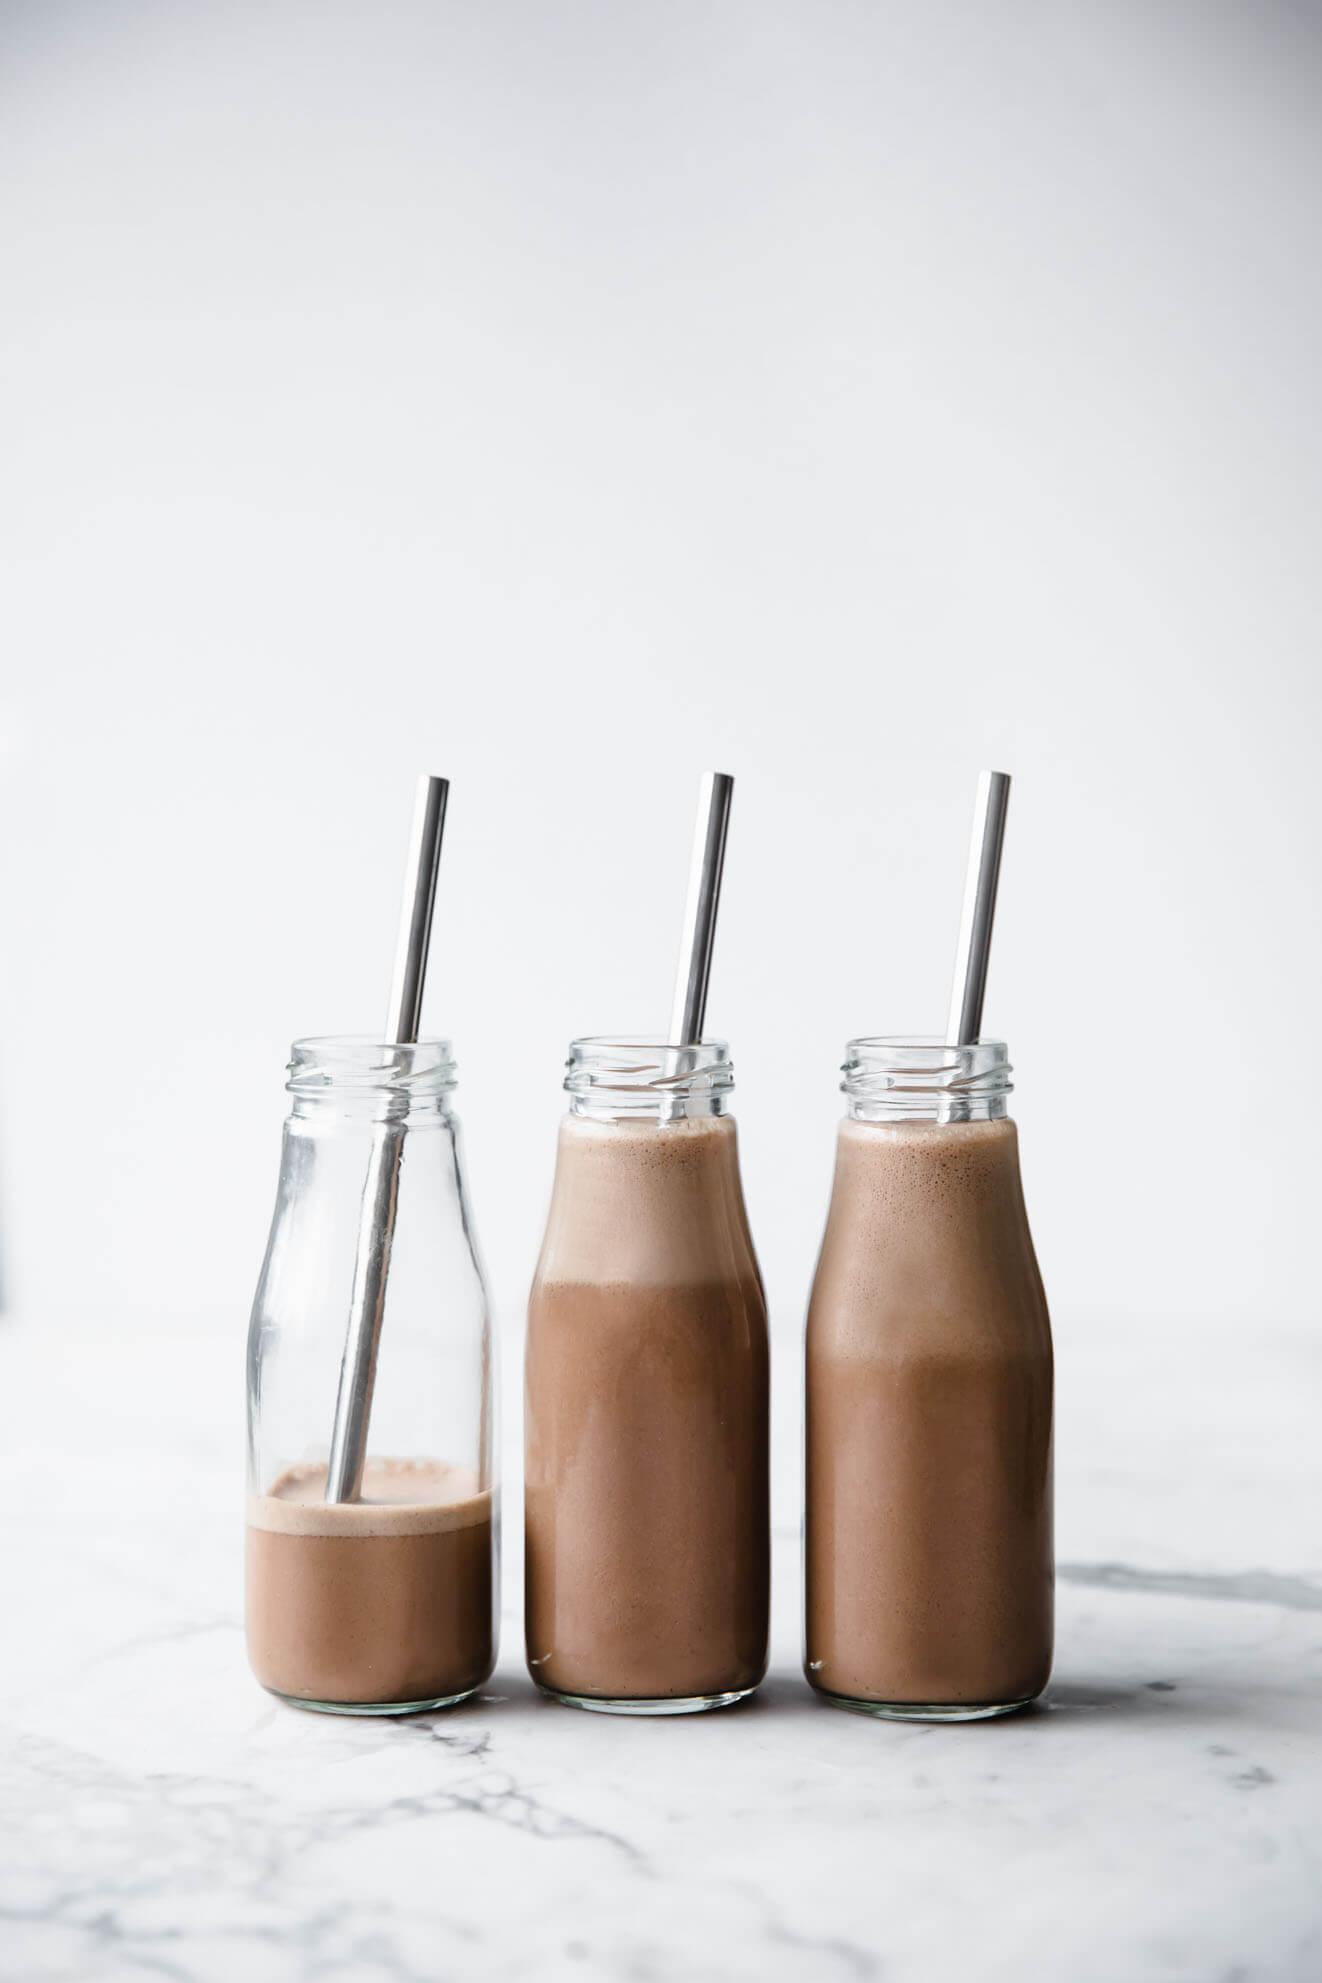 Vegan Chocolate Hazelnut Milk